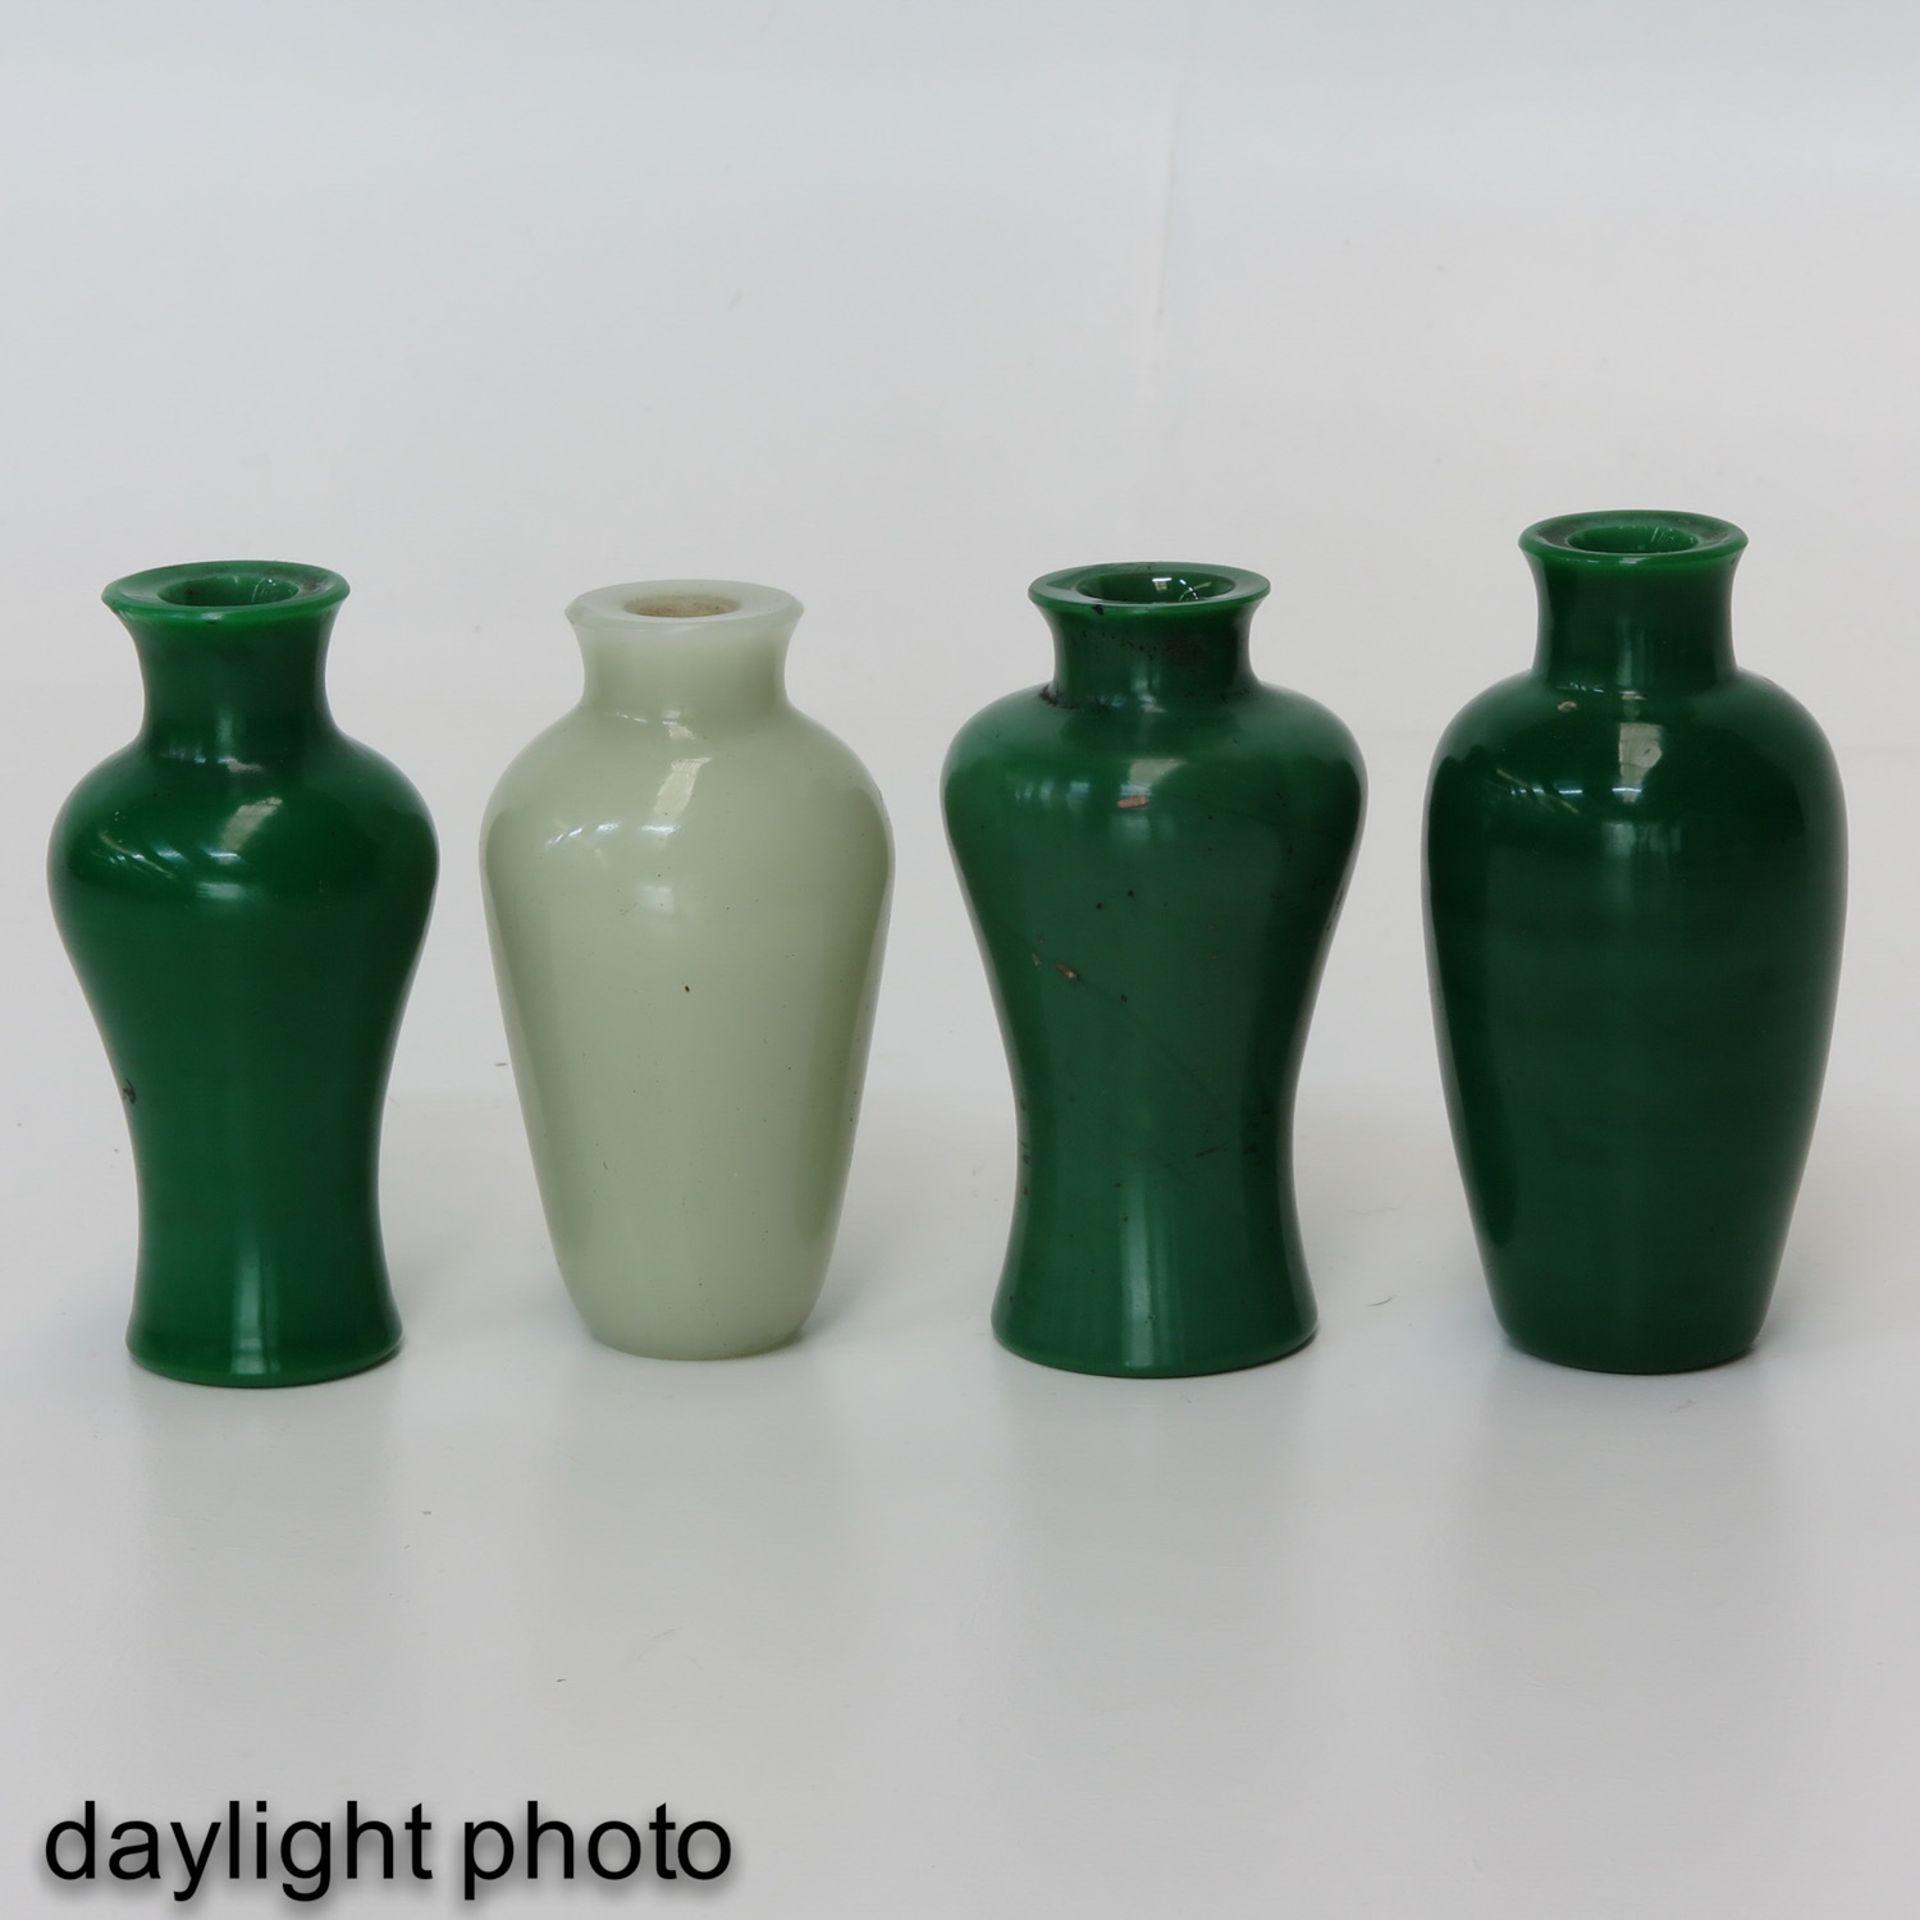 Los 7044 - A Collection of 4 Jade Vases